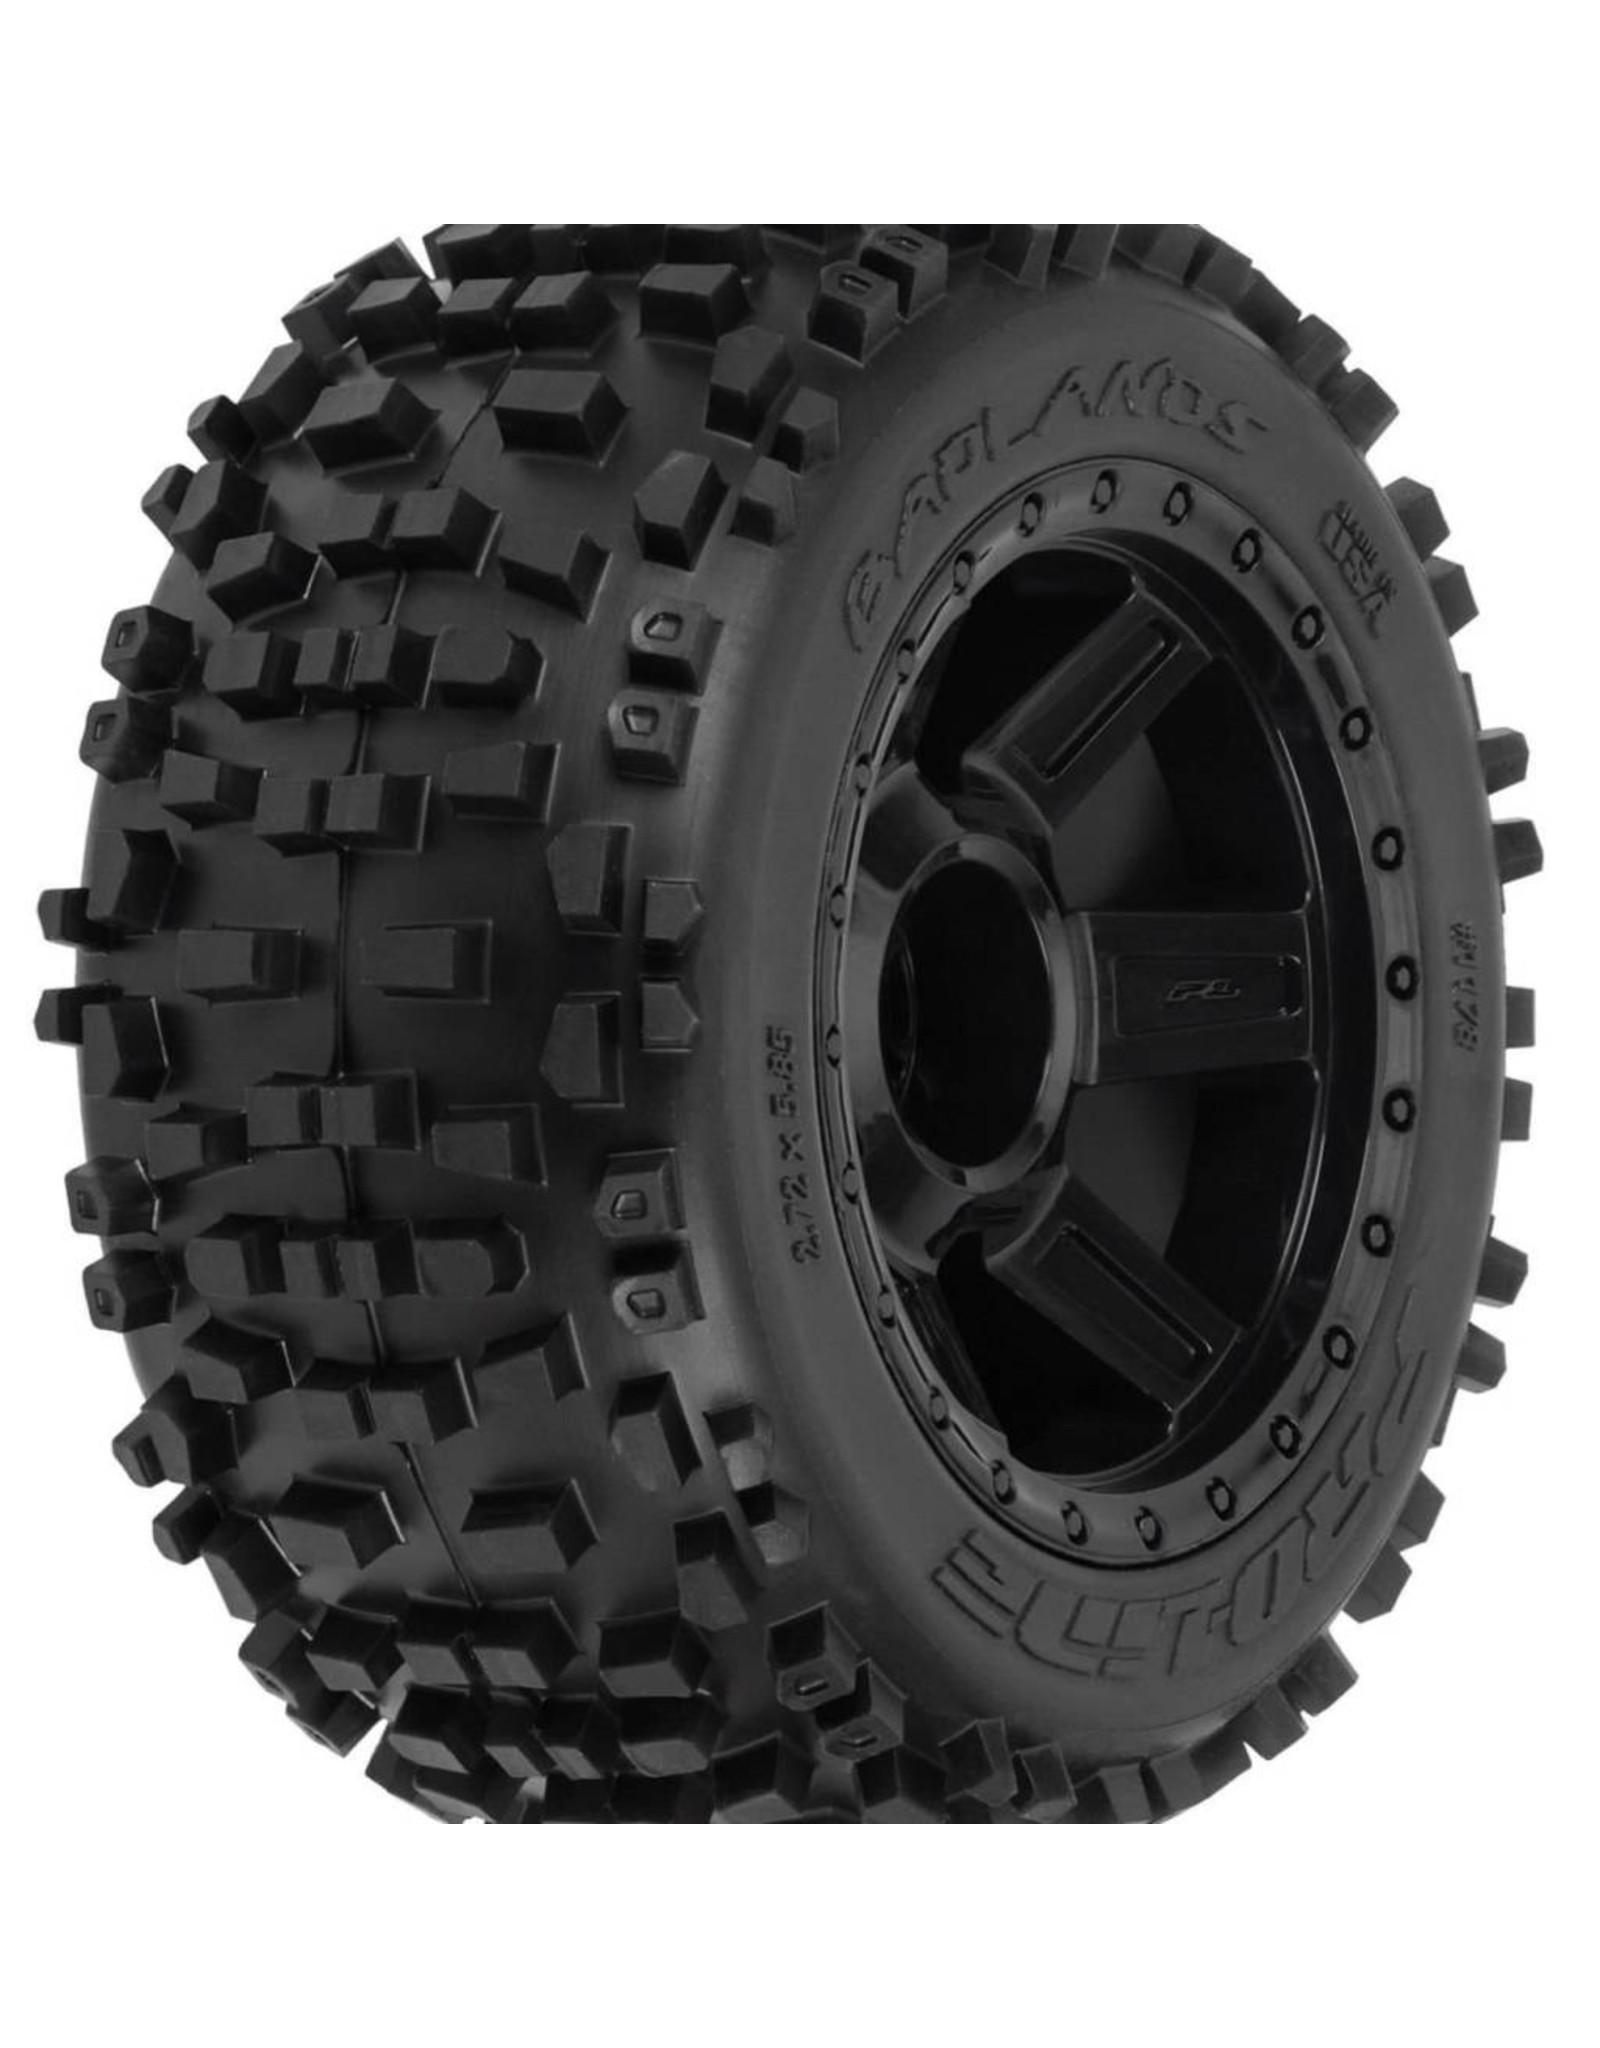 Pro-Line Racing Badlands 3.8 TRA Mnt Desperado 1/2Off 17mmWhl,Blk (117811)